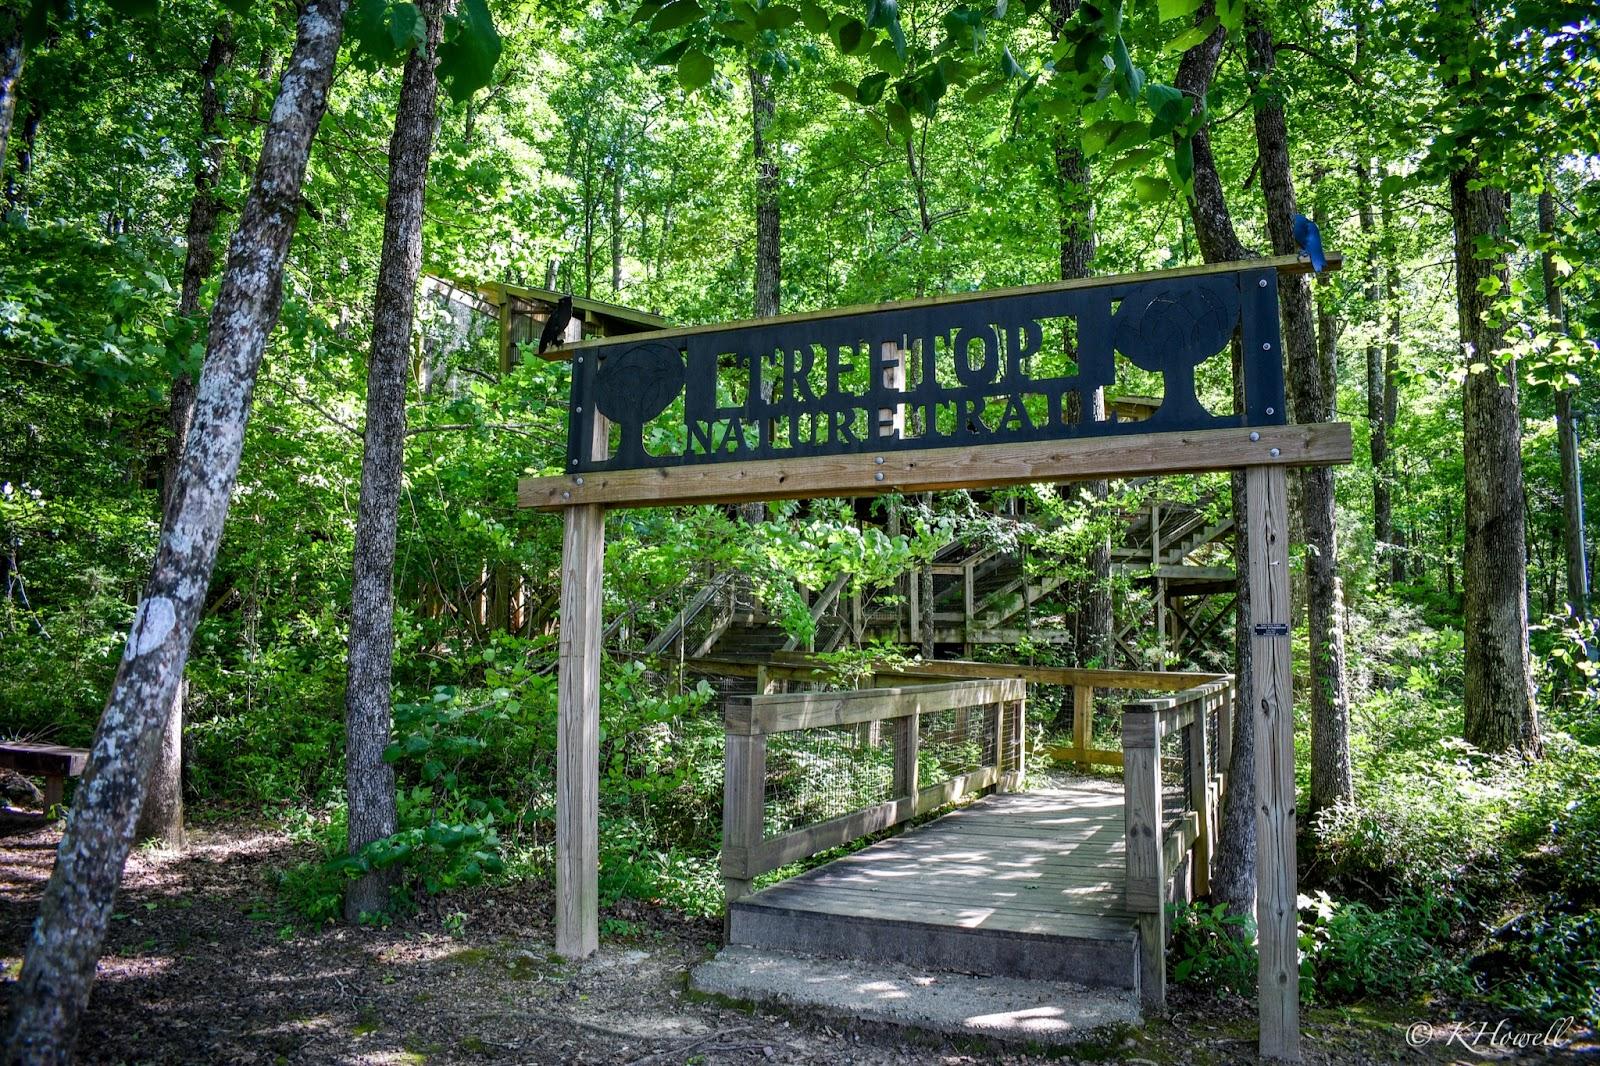 Treetop Nature Trail at Oak Mountain State Park in Pelham, AL